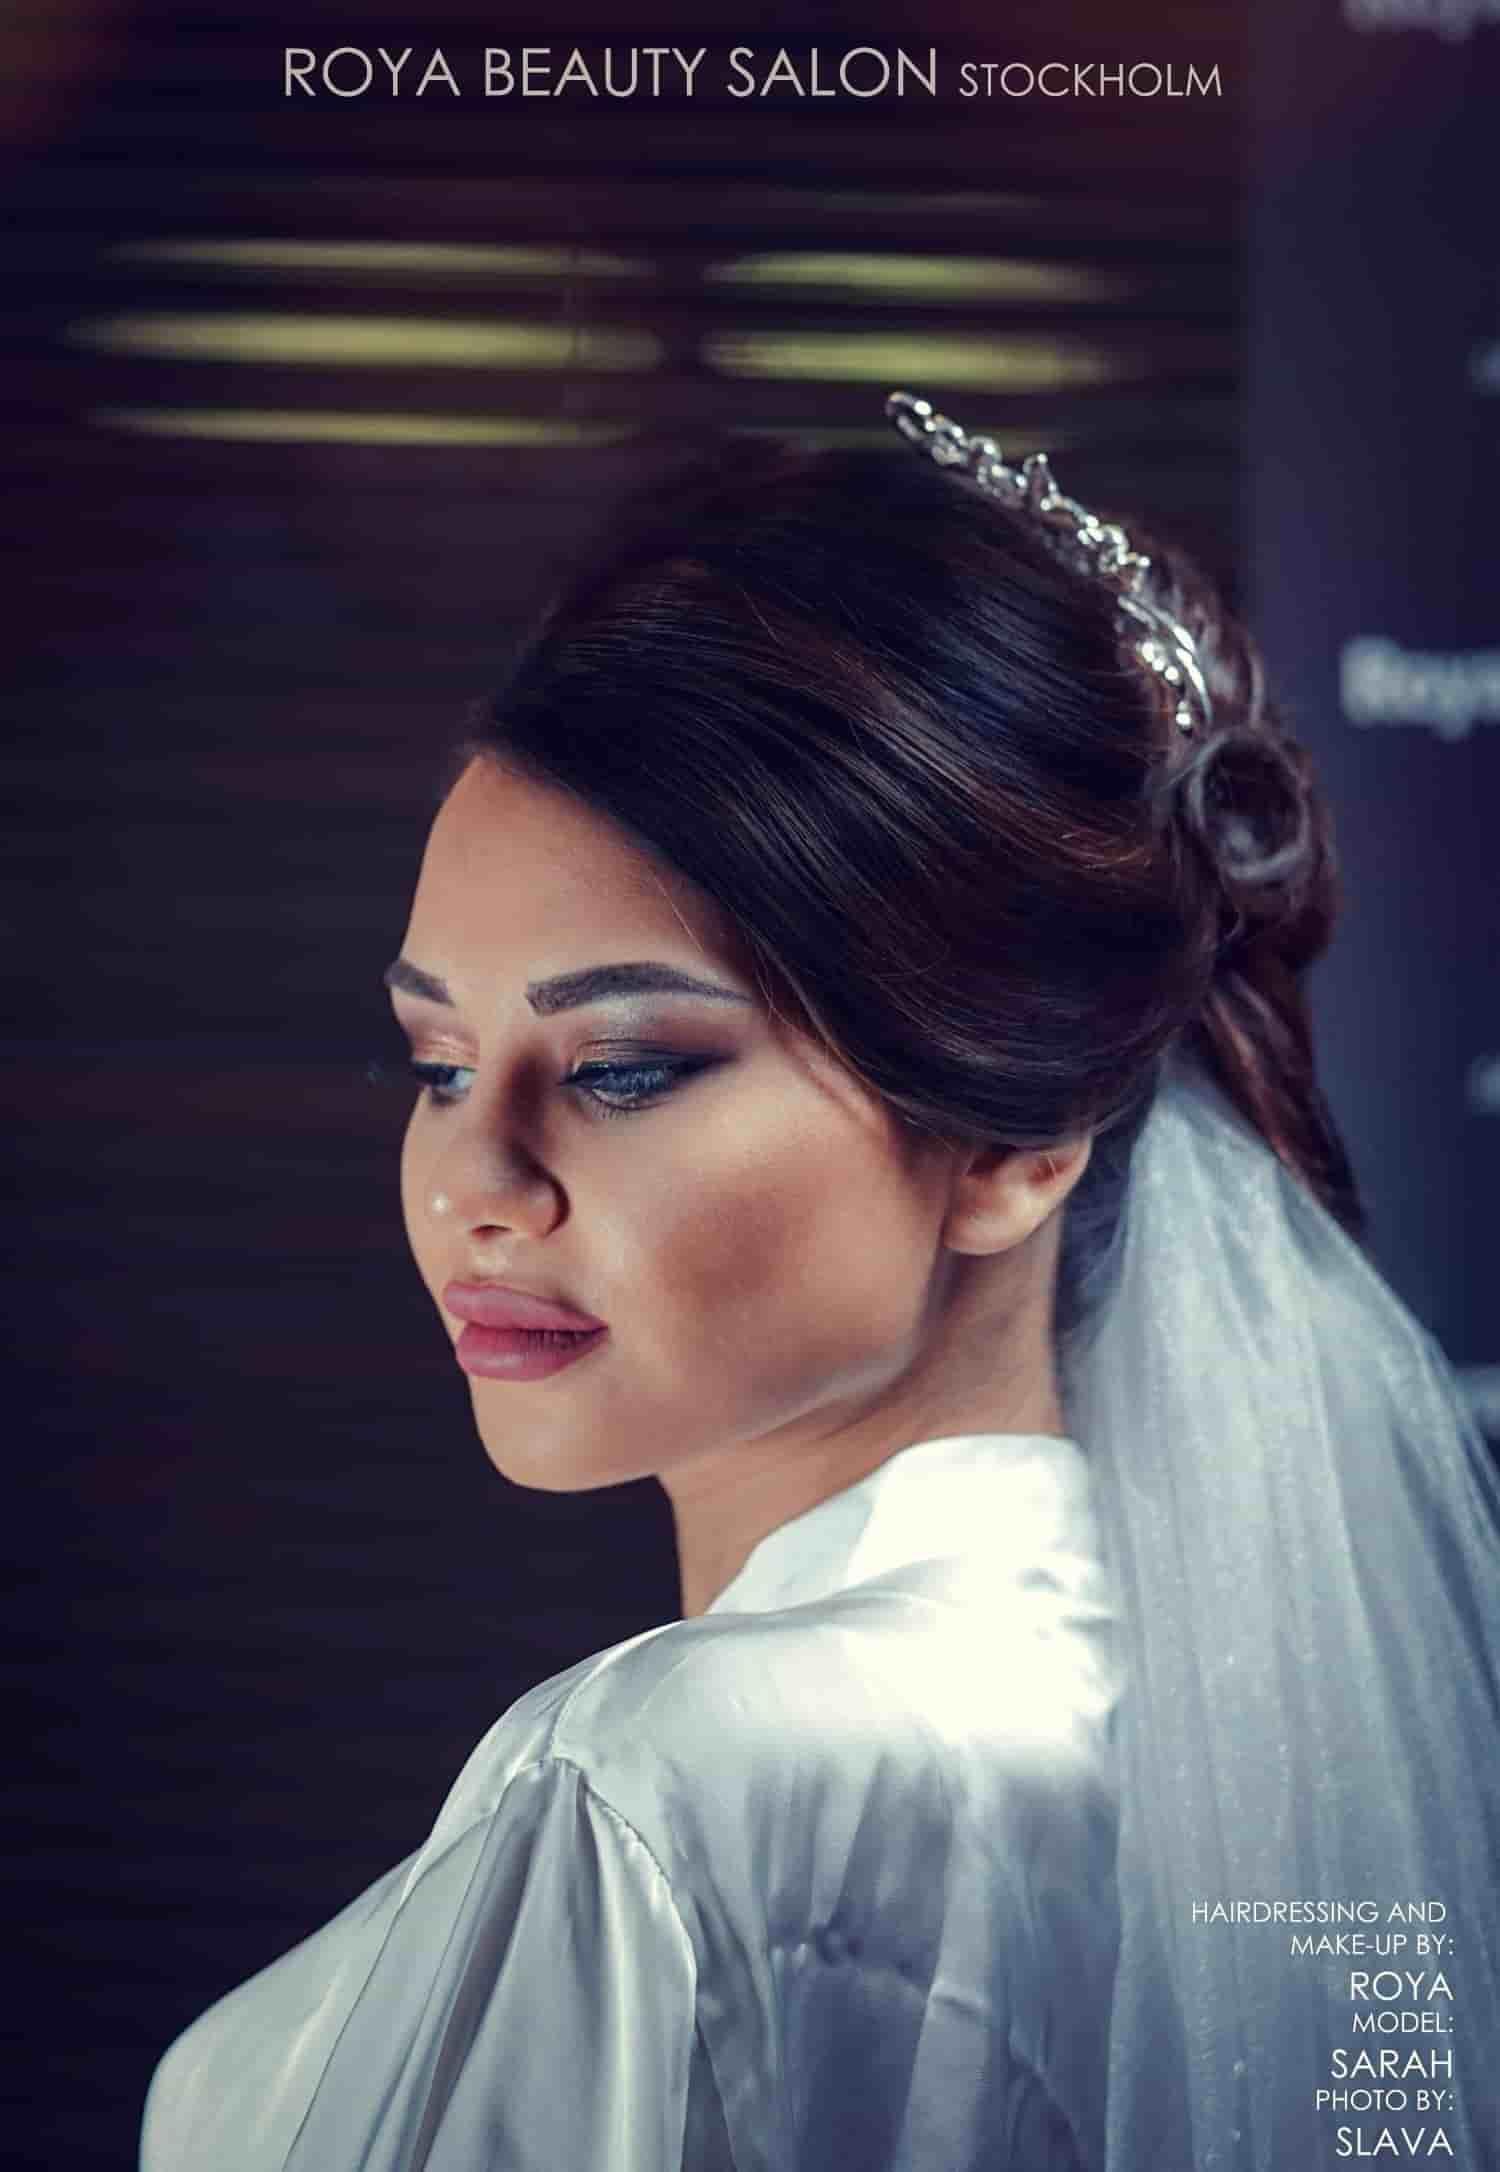 Brud-11-Roya-Beauty-Salon